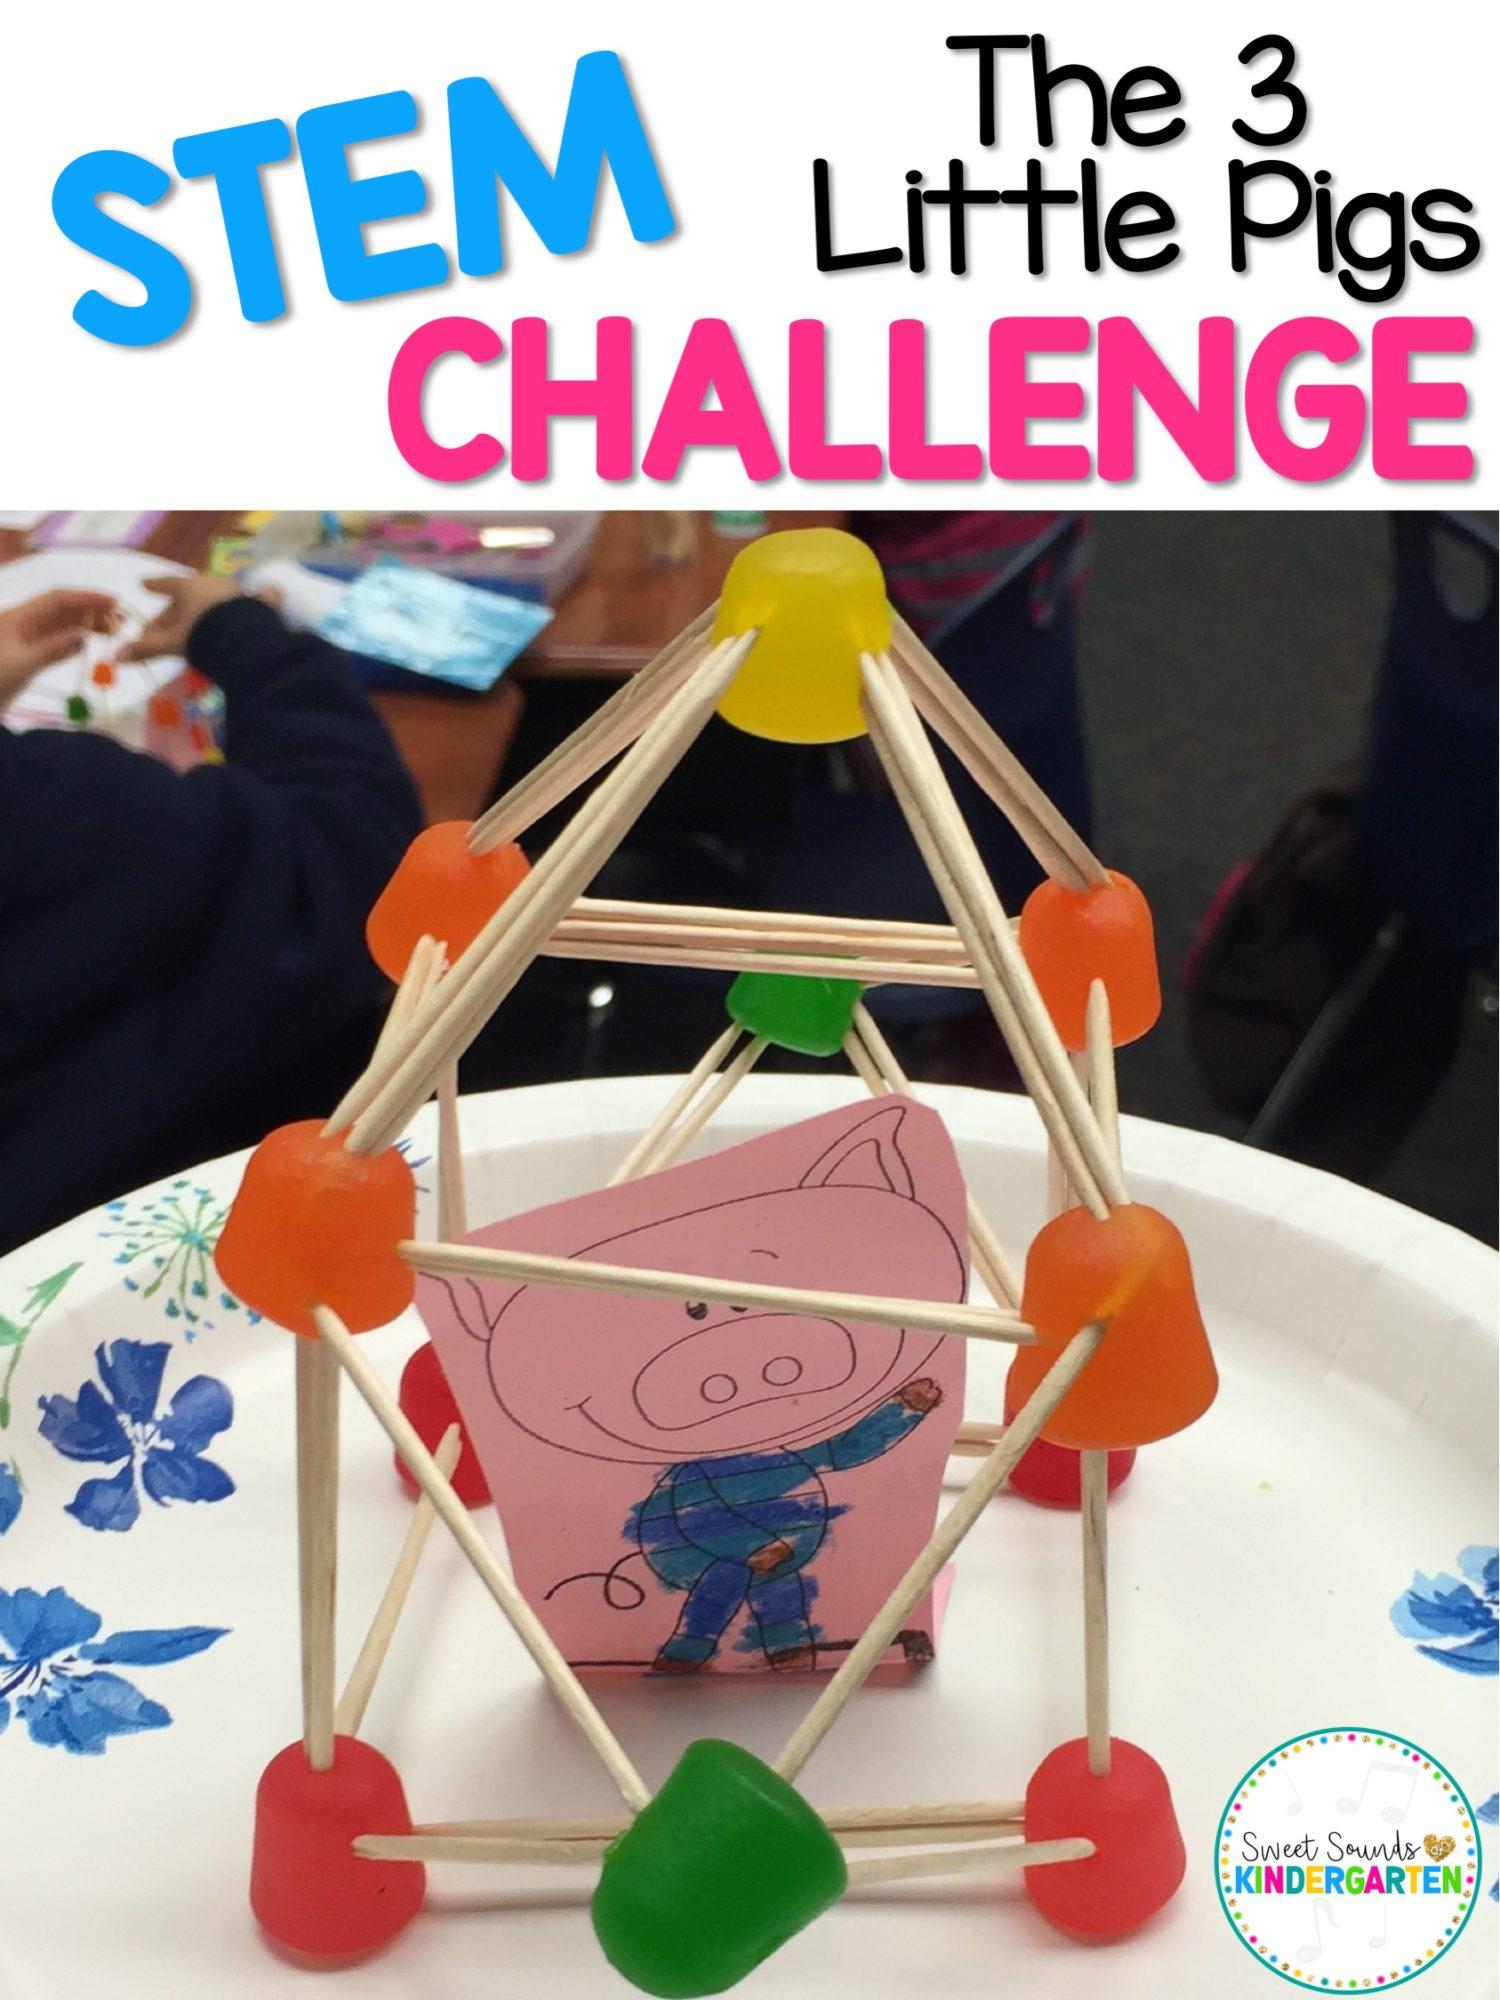 The 3 Little Pigs Stem Challenge